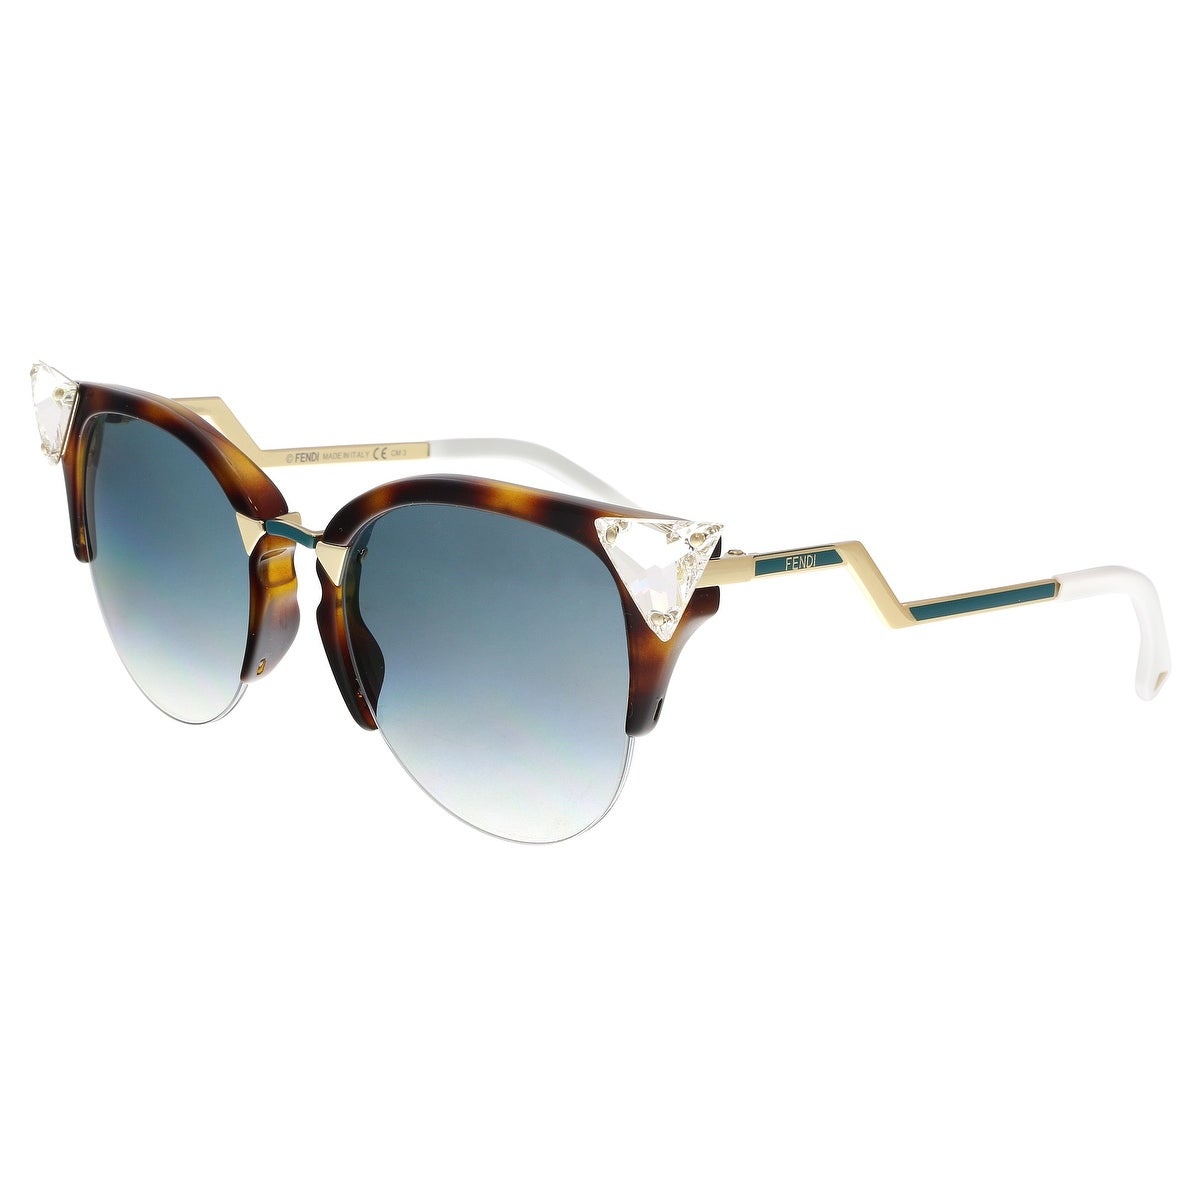 62146fbf55d8 Fendi Women's Sunglasses | Find Great Sunglasses Deals Shopping at Overstock